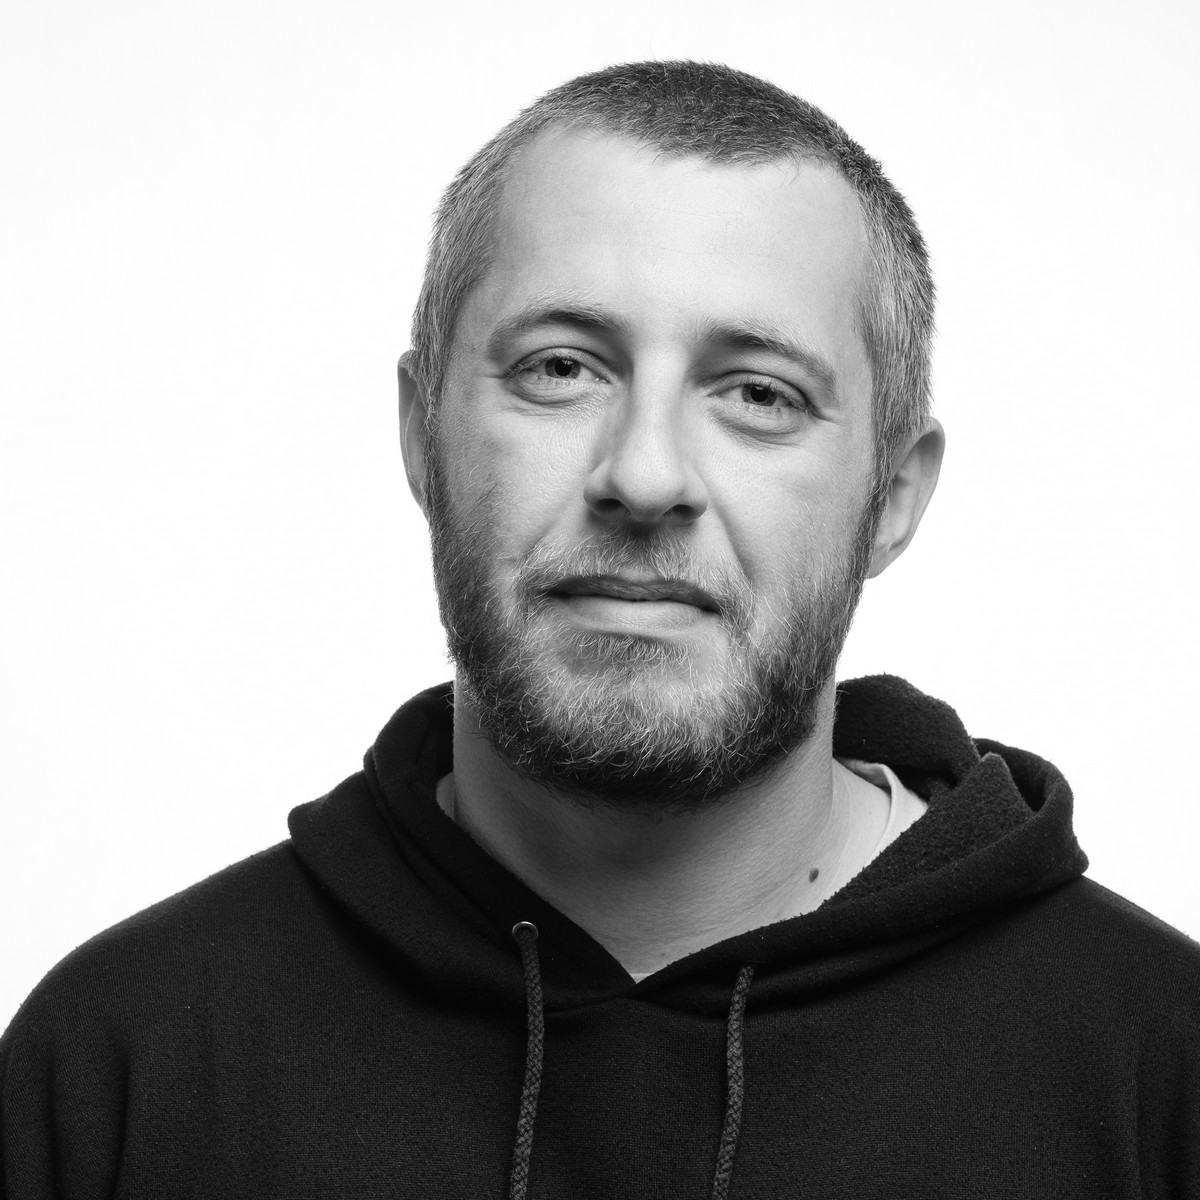 Martin Malatinec